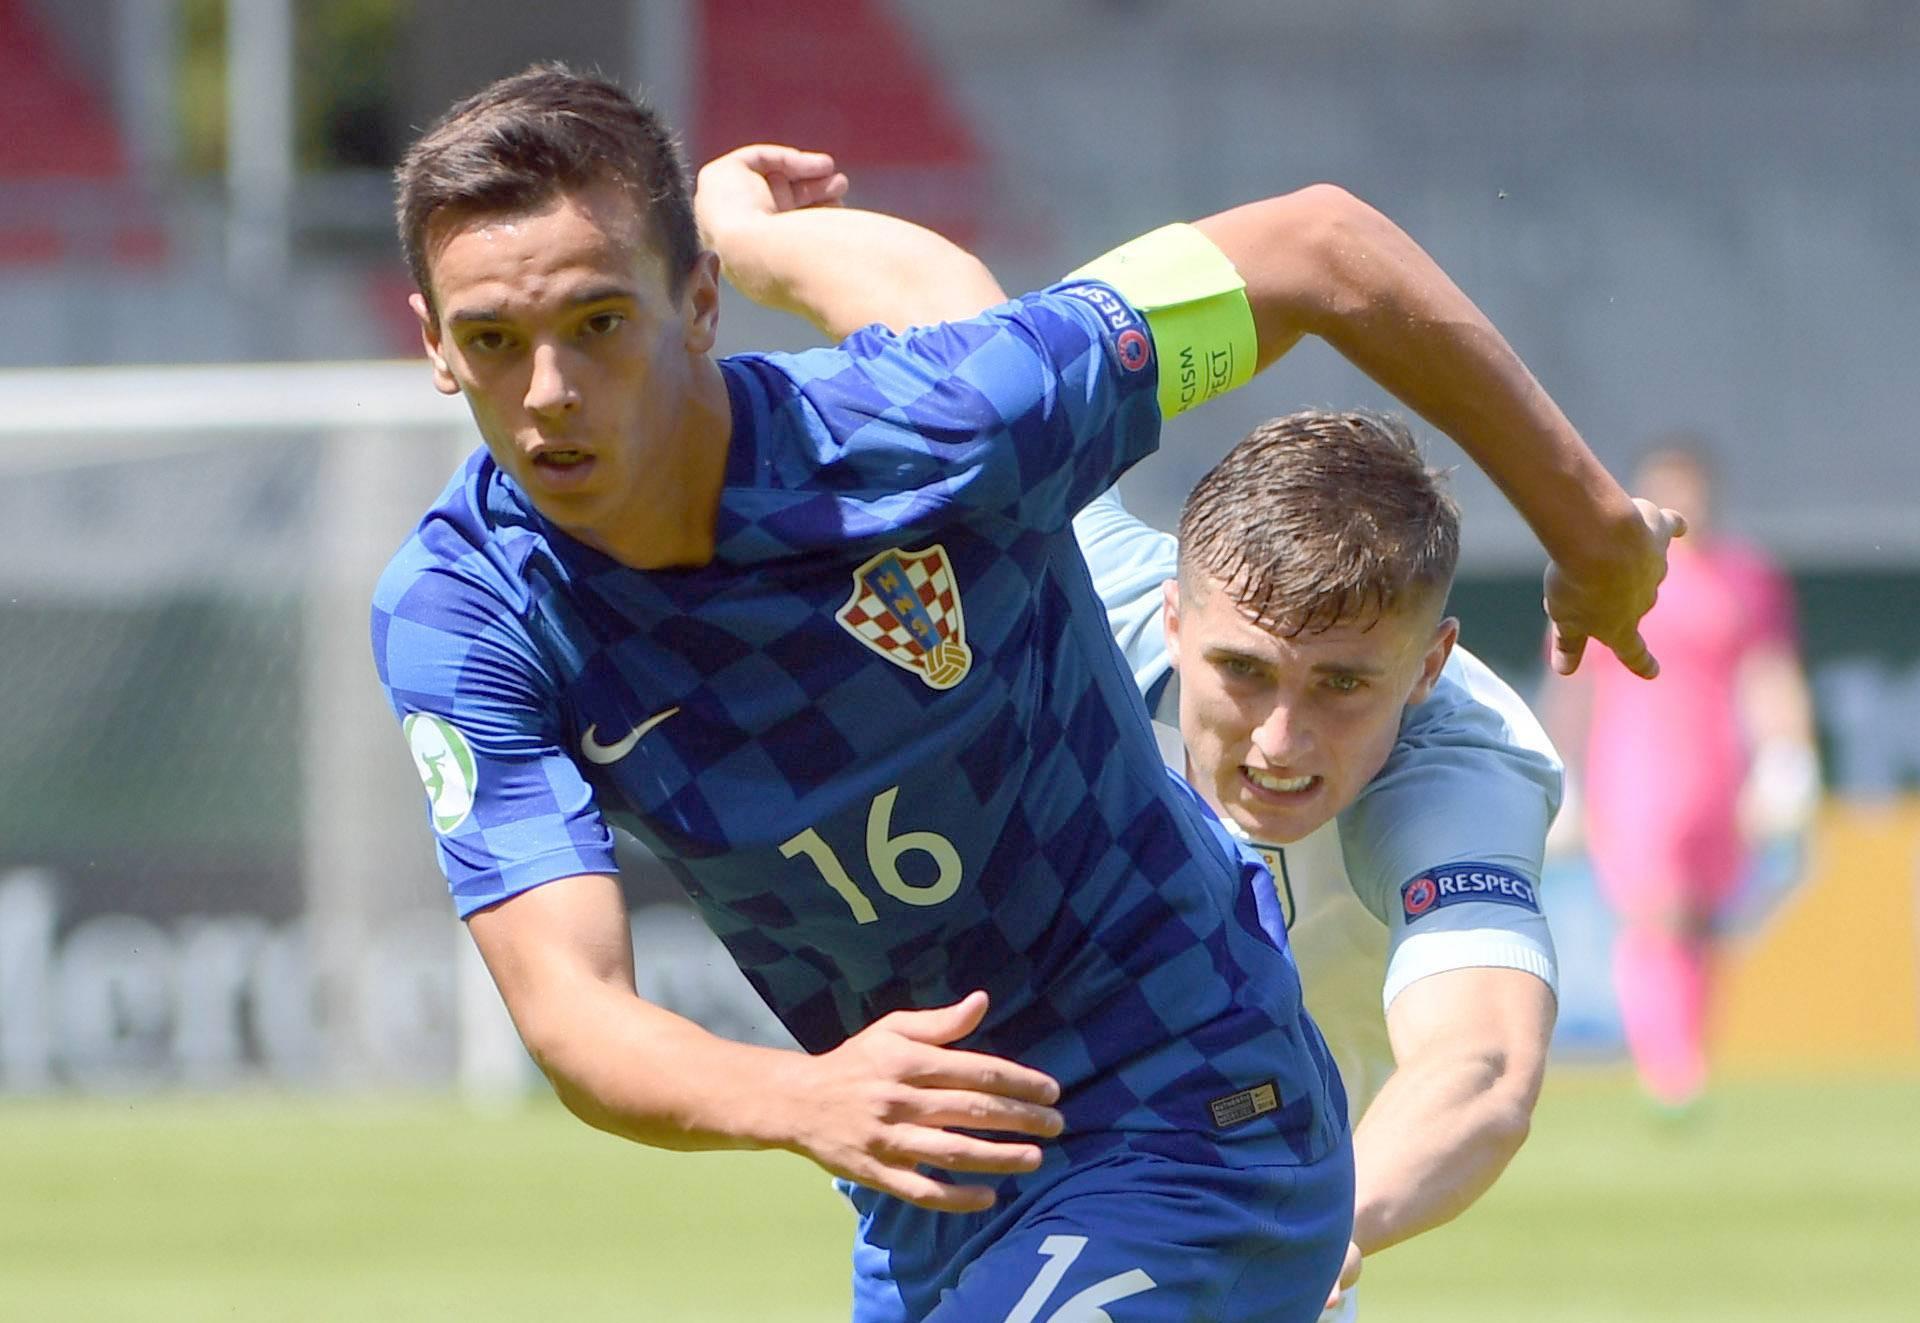 U19 European Championship: England vs. Croatia